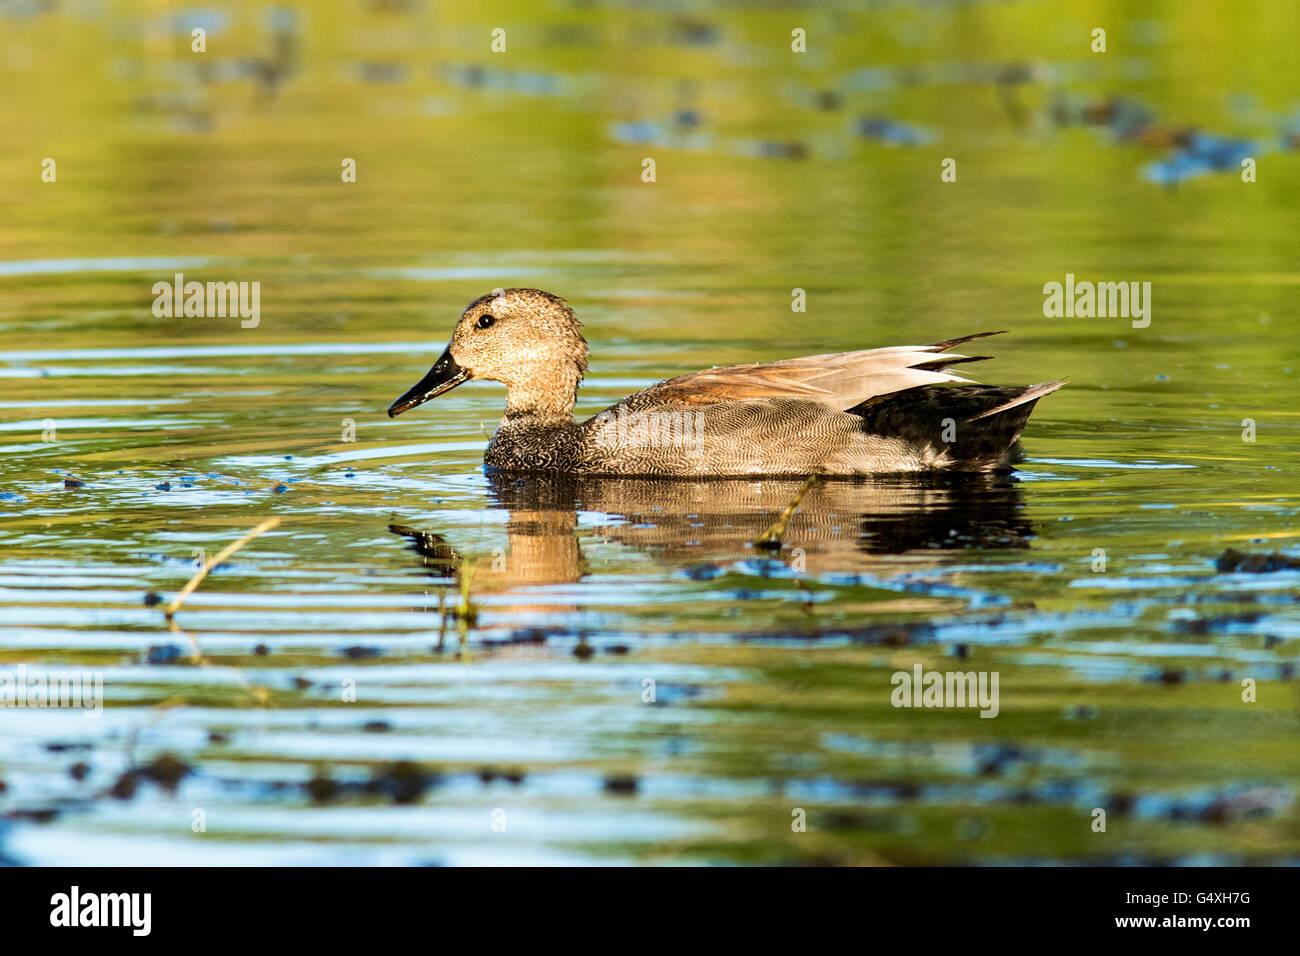 Male Gadwall Duck (Anas strepera) - Camp Lula Sams, Brownsville; Texas, USA - Stock Image